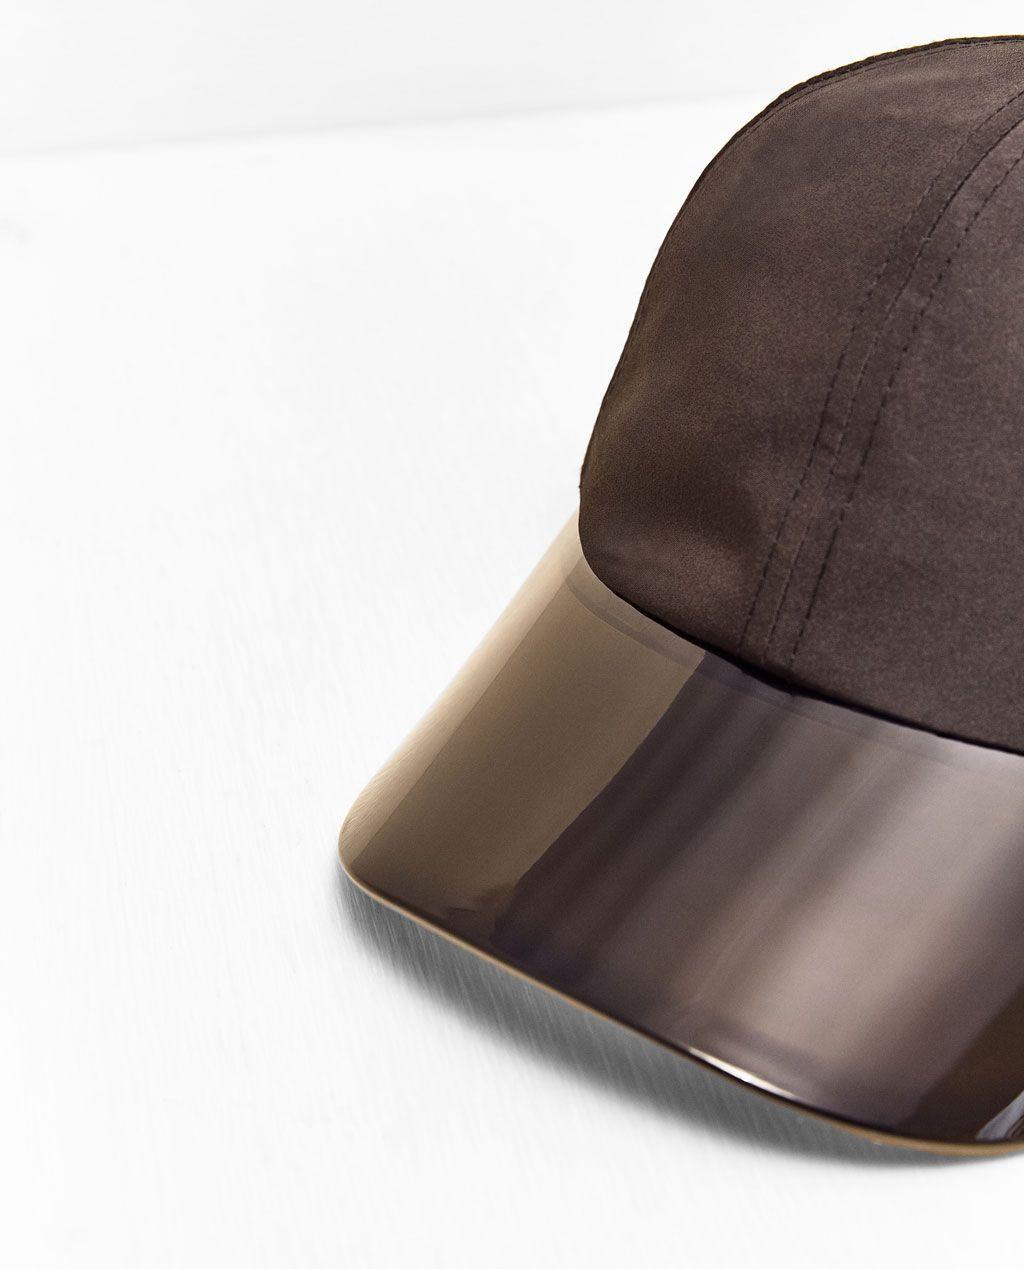 5dd3ab53 ZARA - WOMAN - SEMI-TRANSPARENT SPORTY CAP WITH VISOR | hats | Zara ...